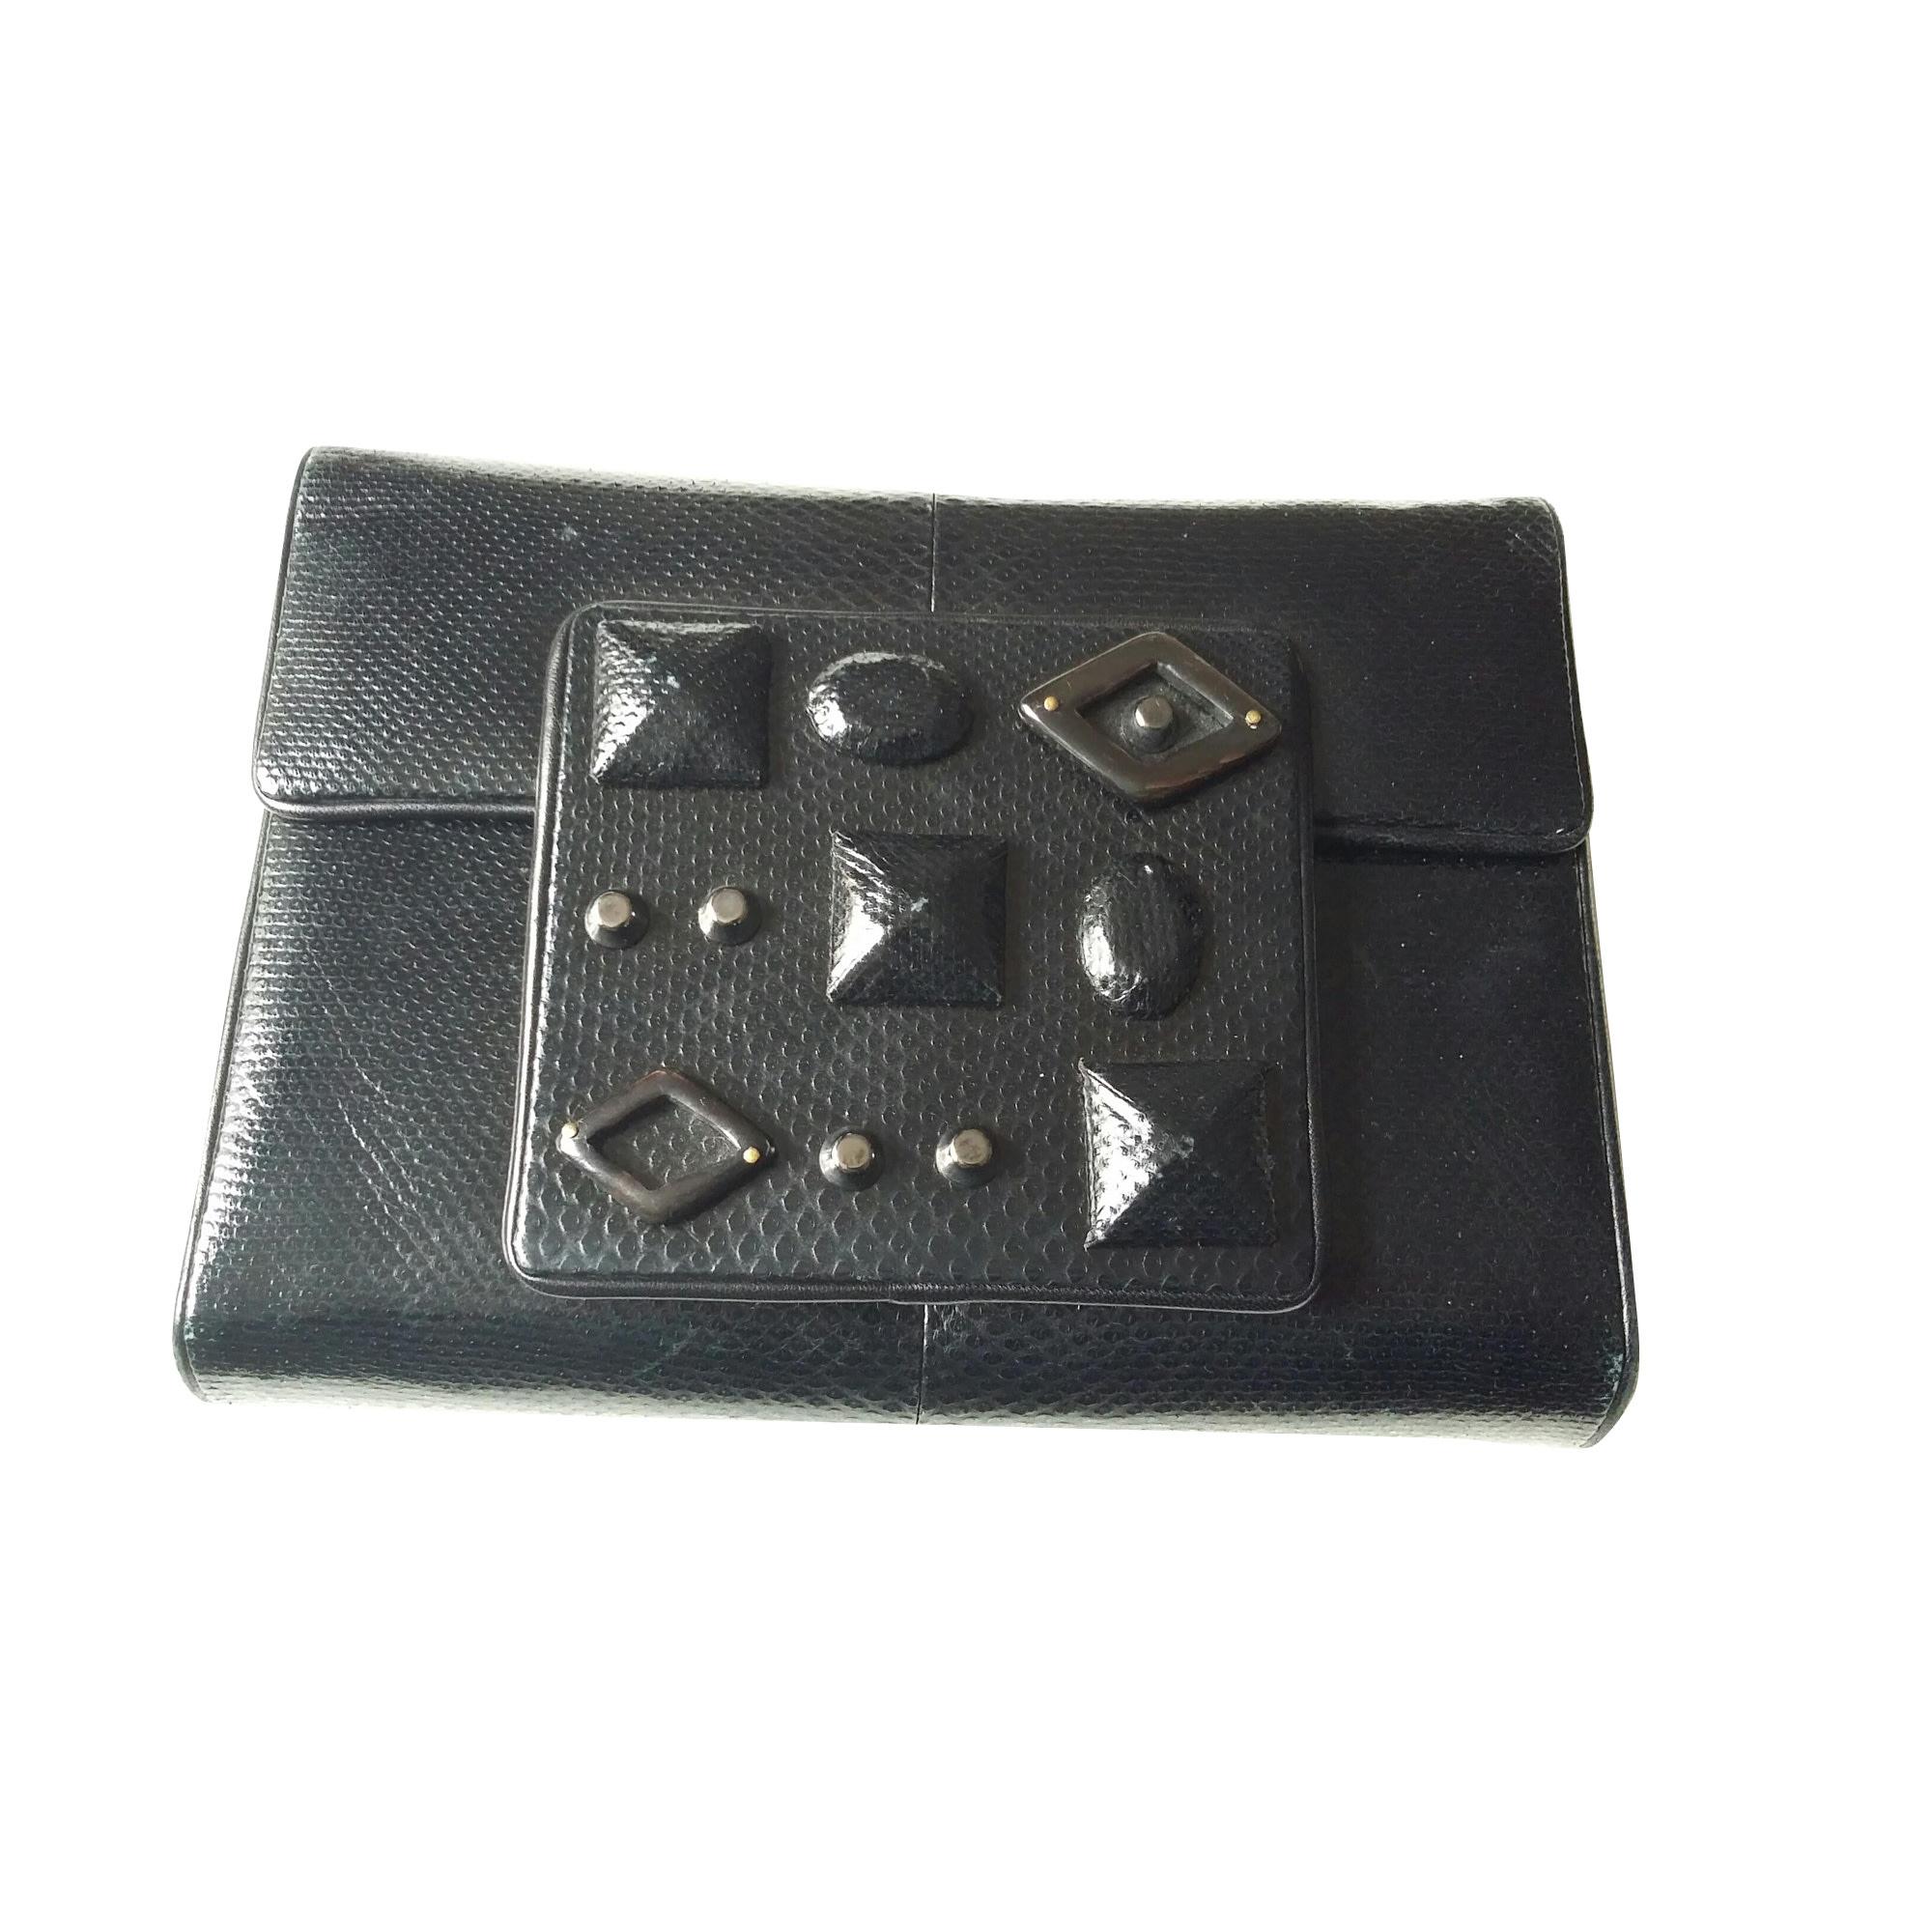 Pochette APOSTROPHE cuir irisé noir